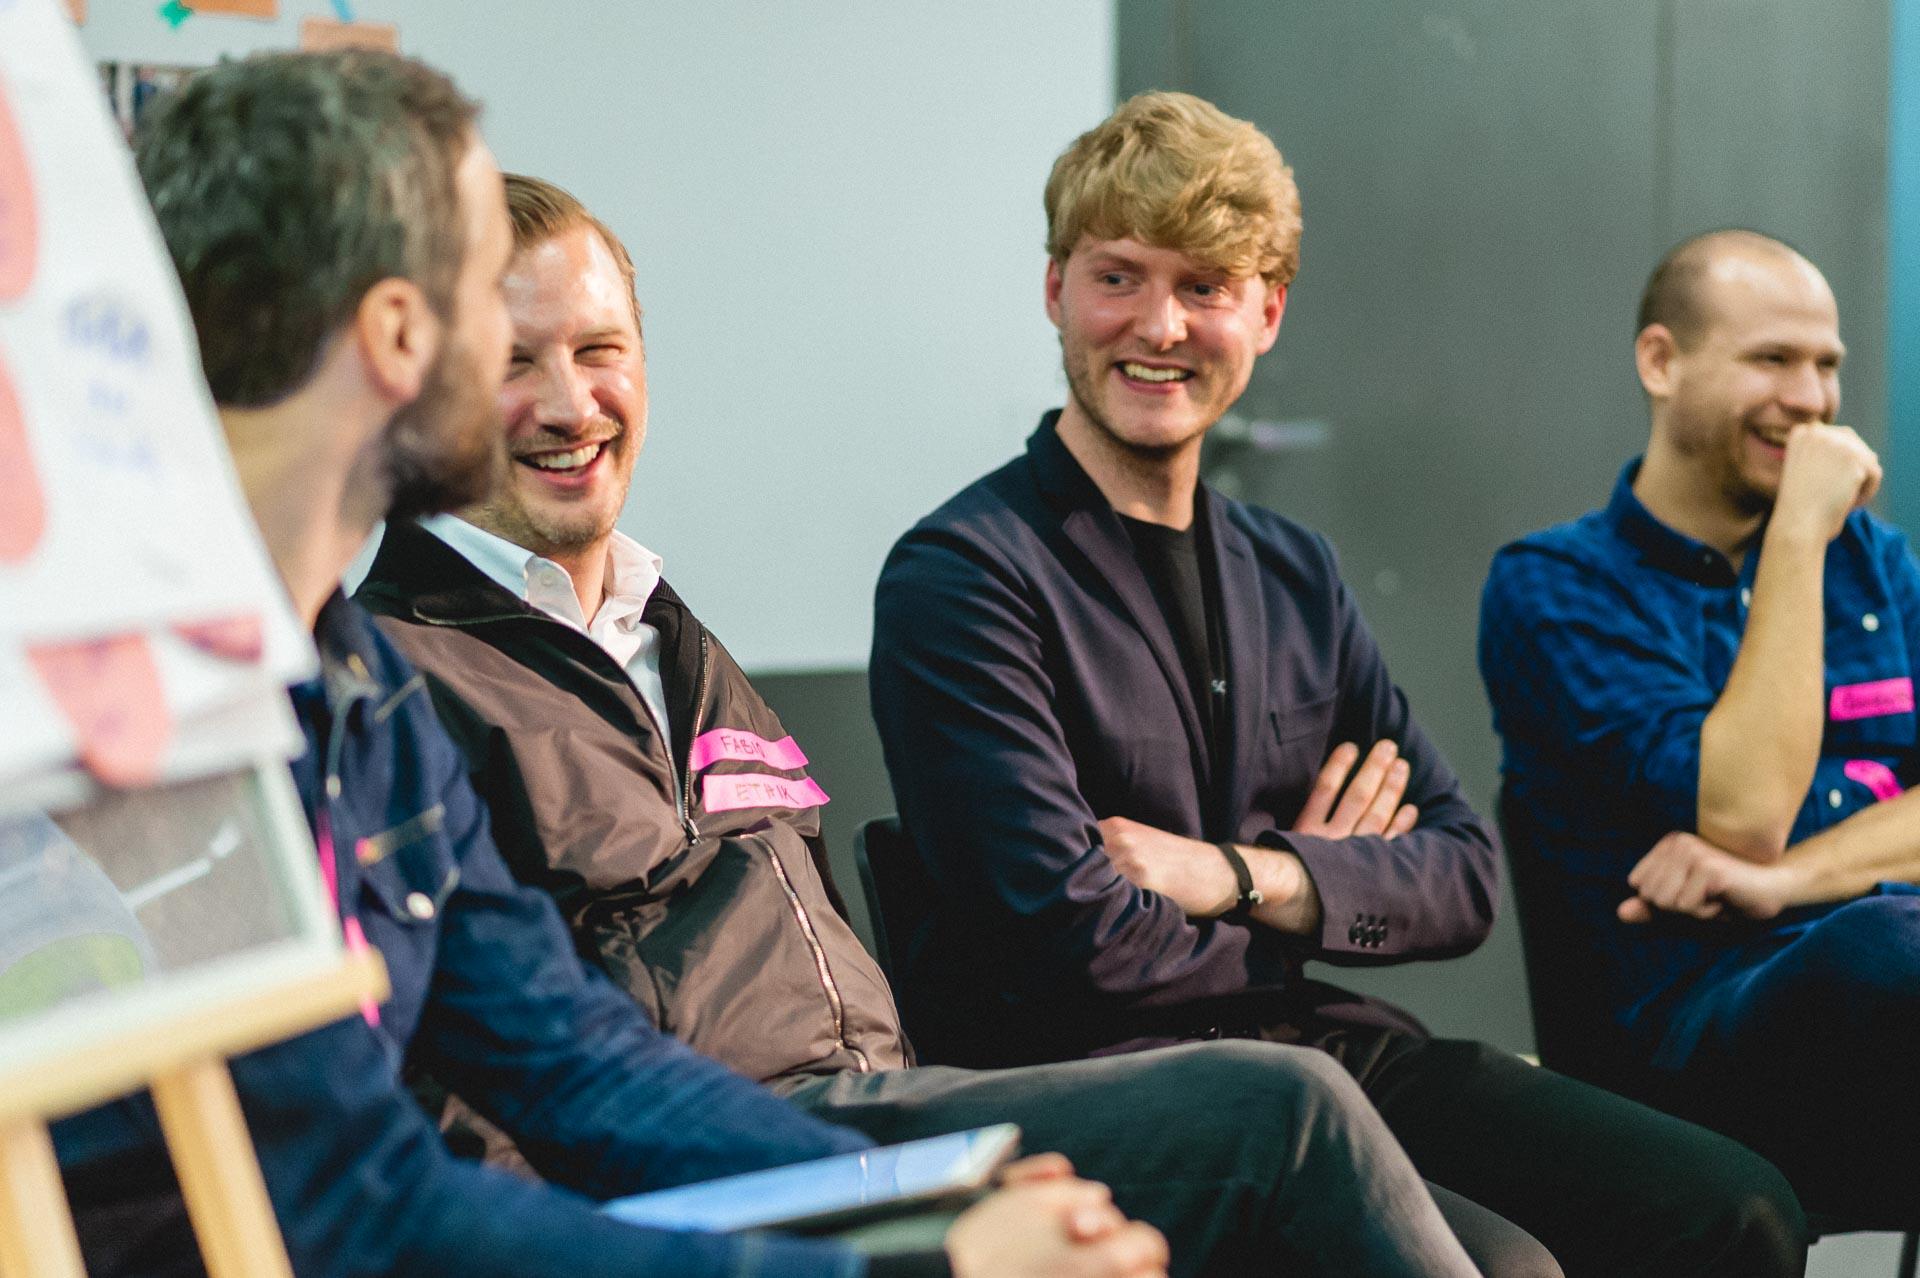 unbubbled Session #5 - Autonomous Design Der Wandel der Mobilität schreitet voran